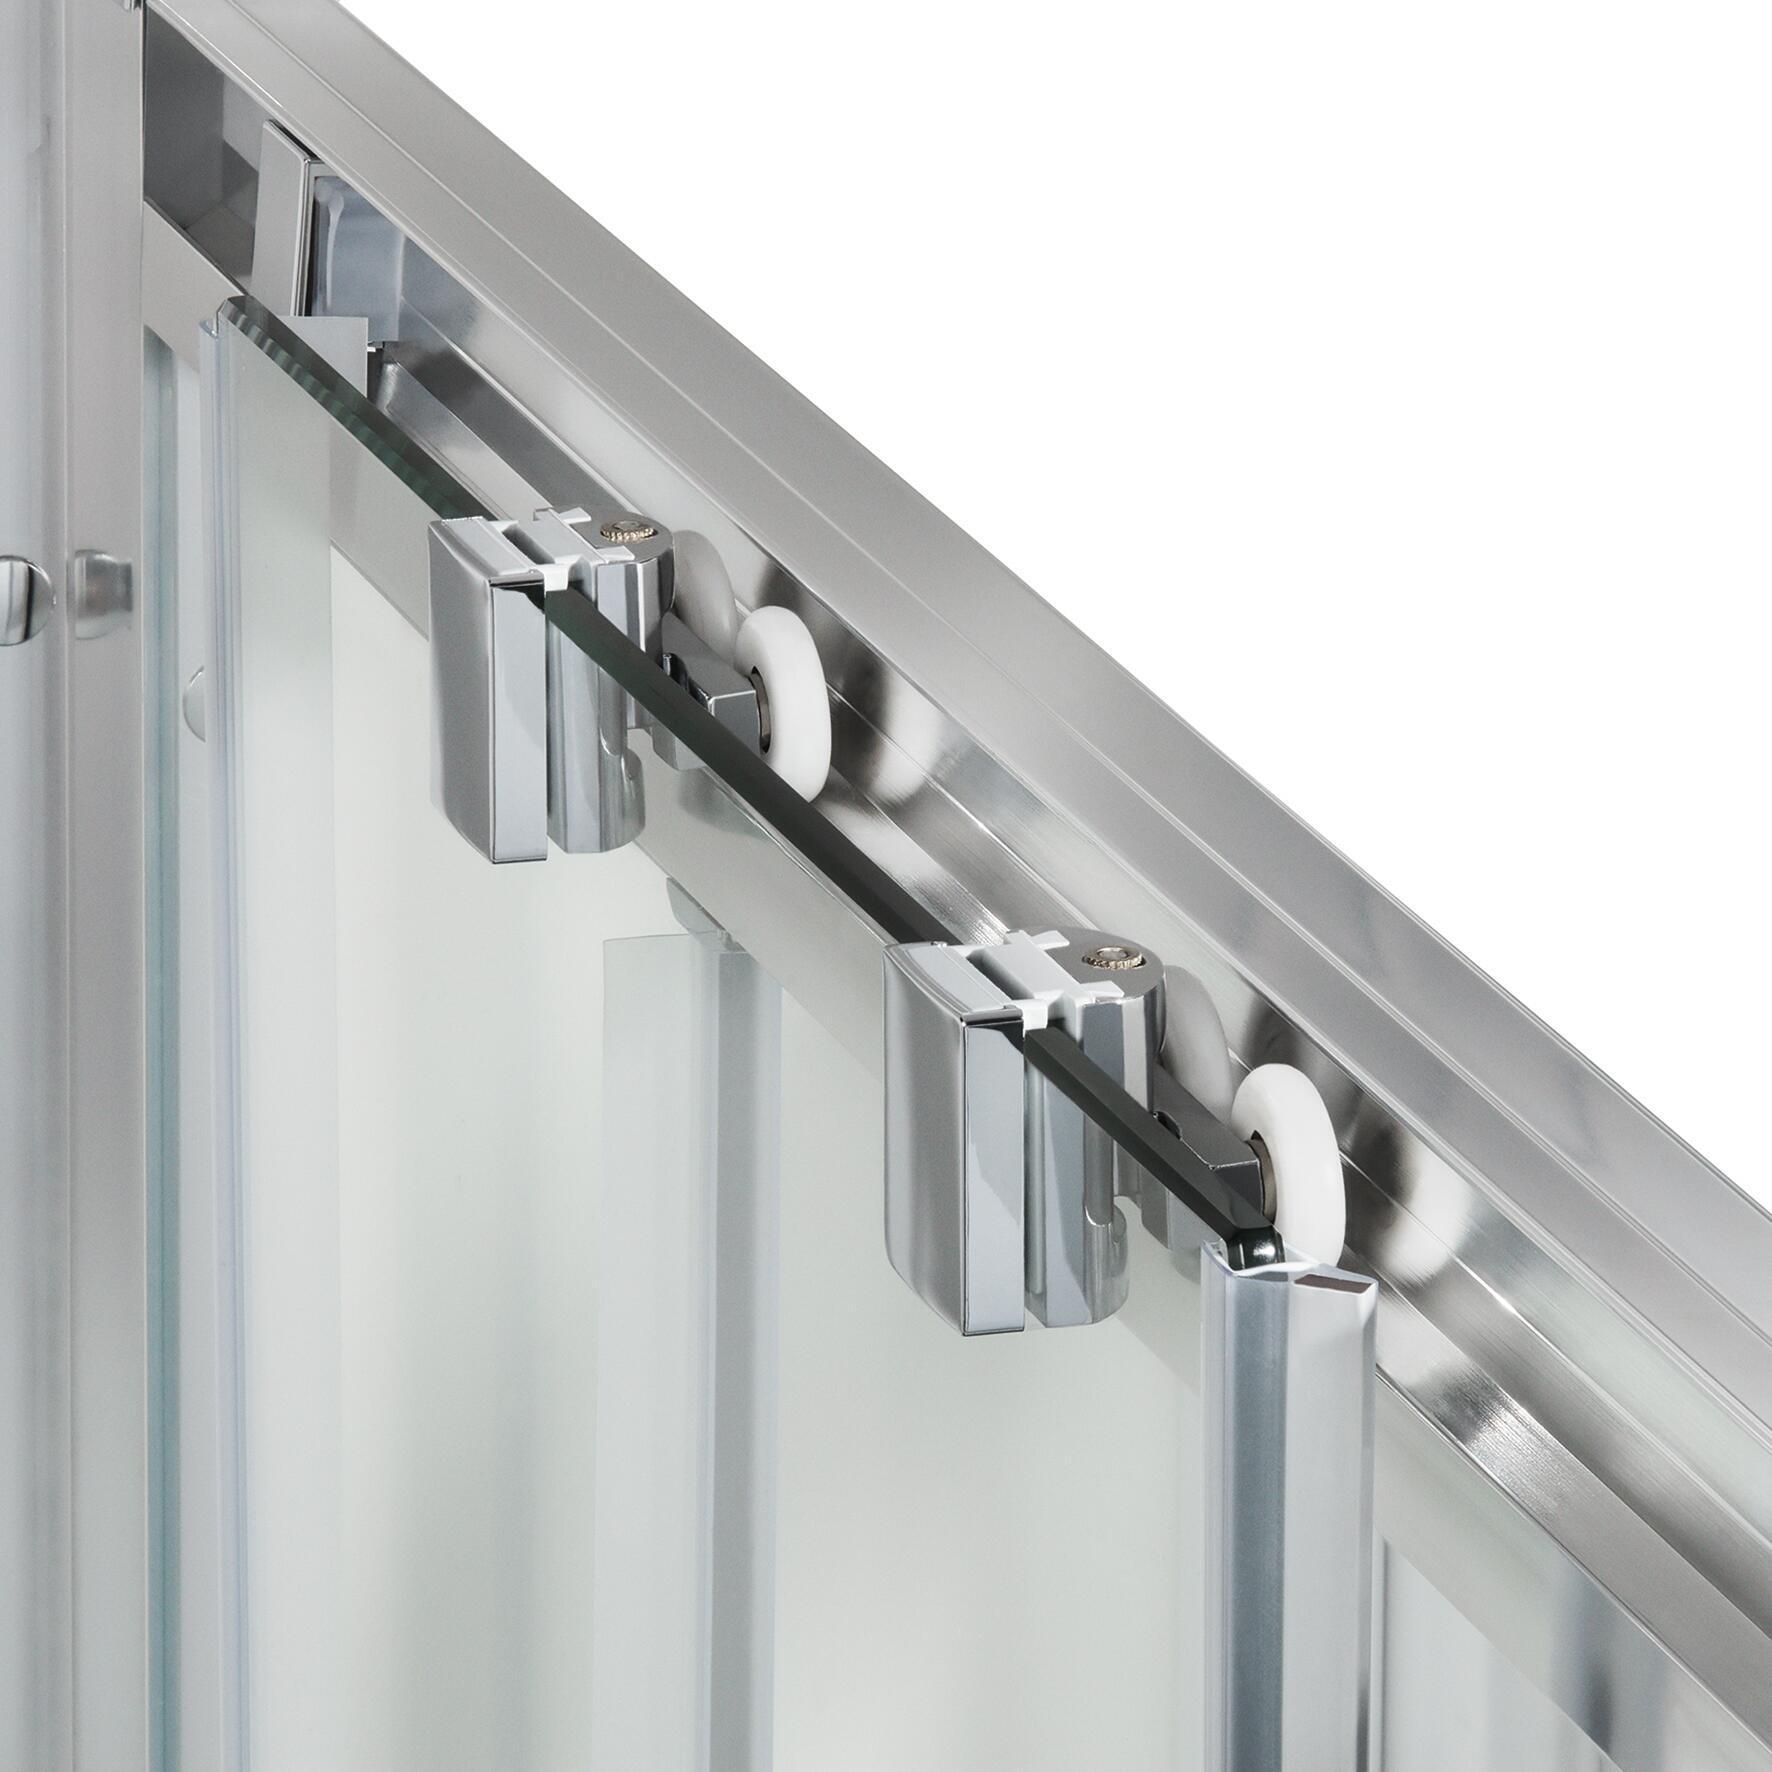 Porta doccia scorrevole Quad 100 cm, H 190 cm in vetro, spessore 6 mm trasparente satinato - 6